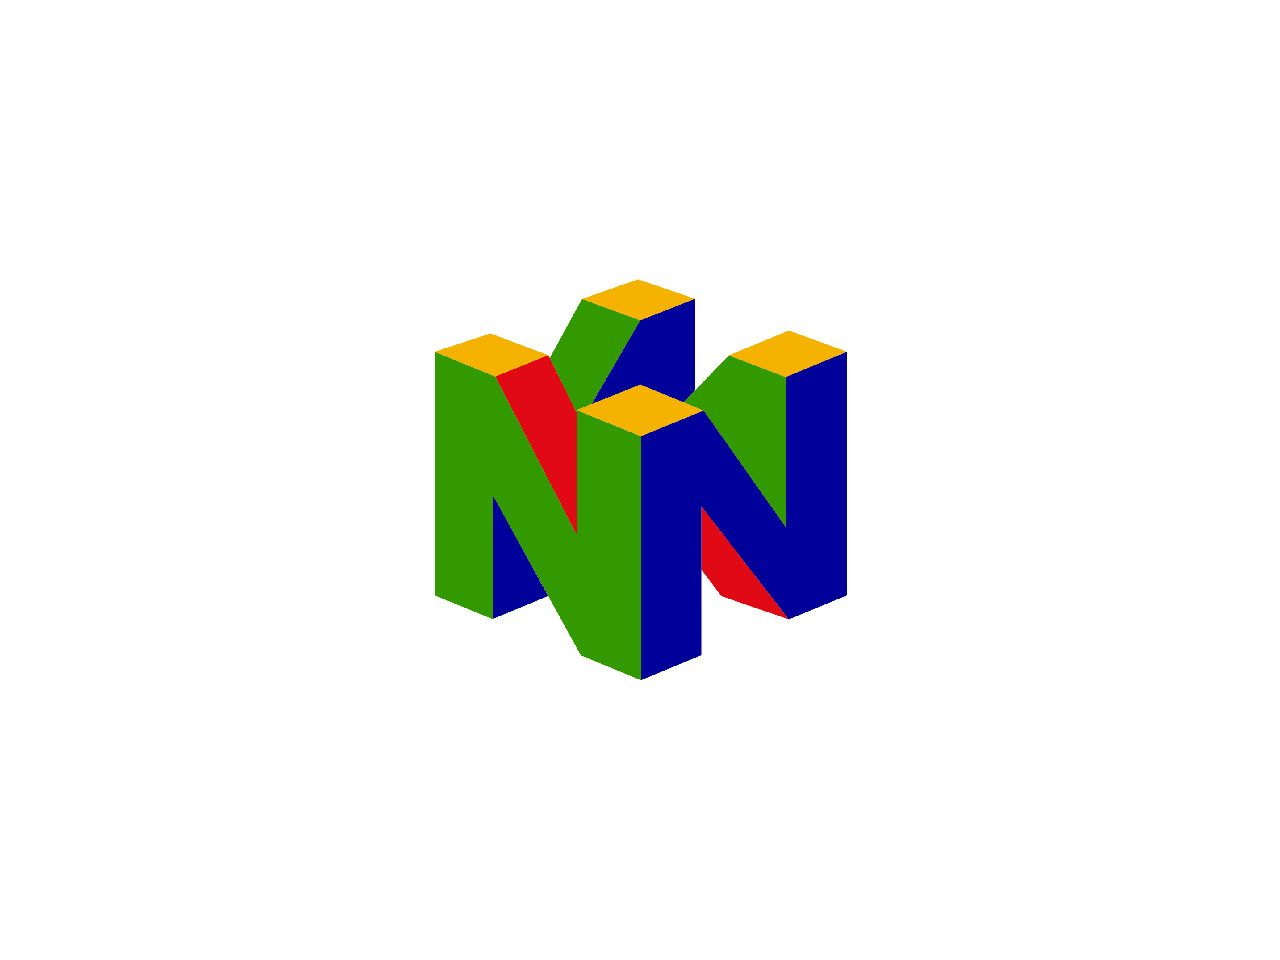 N64 Logo Using Perspective Gverl Pinterest Logos Nintendo 64